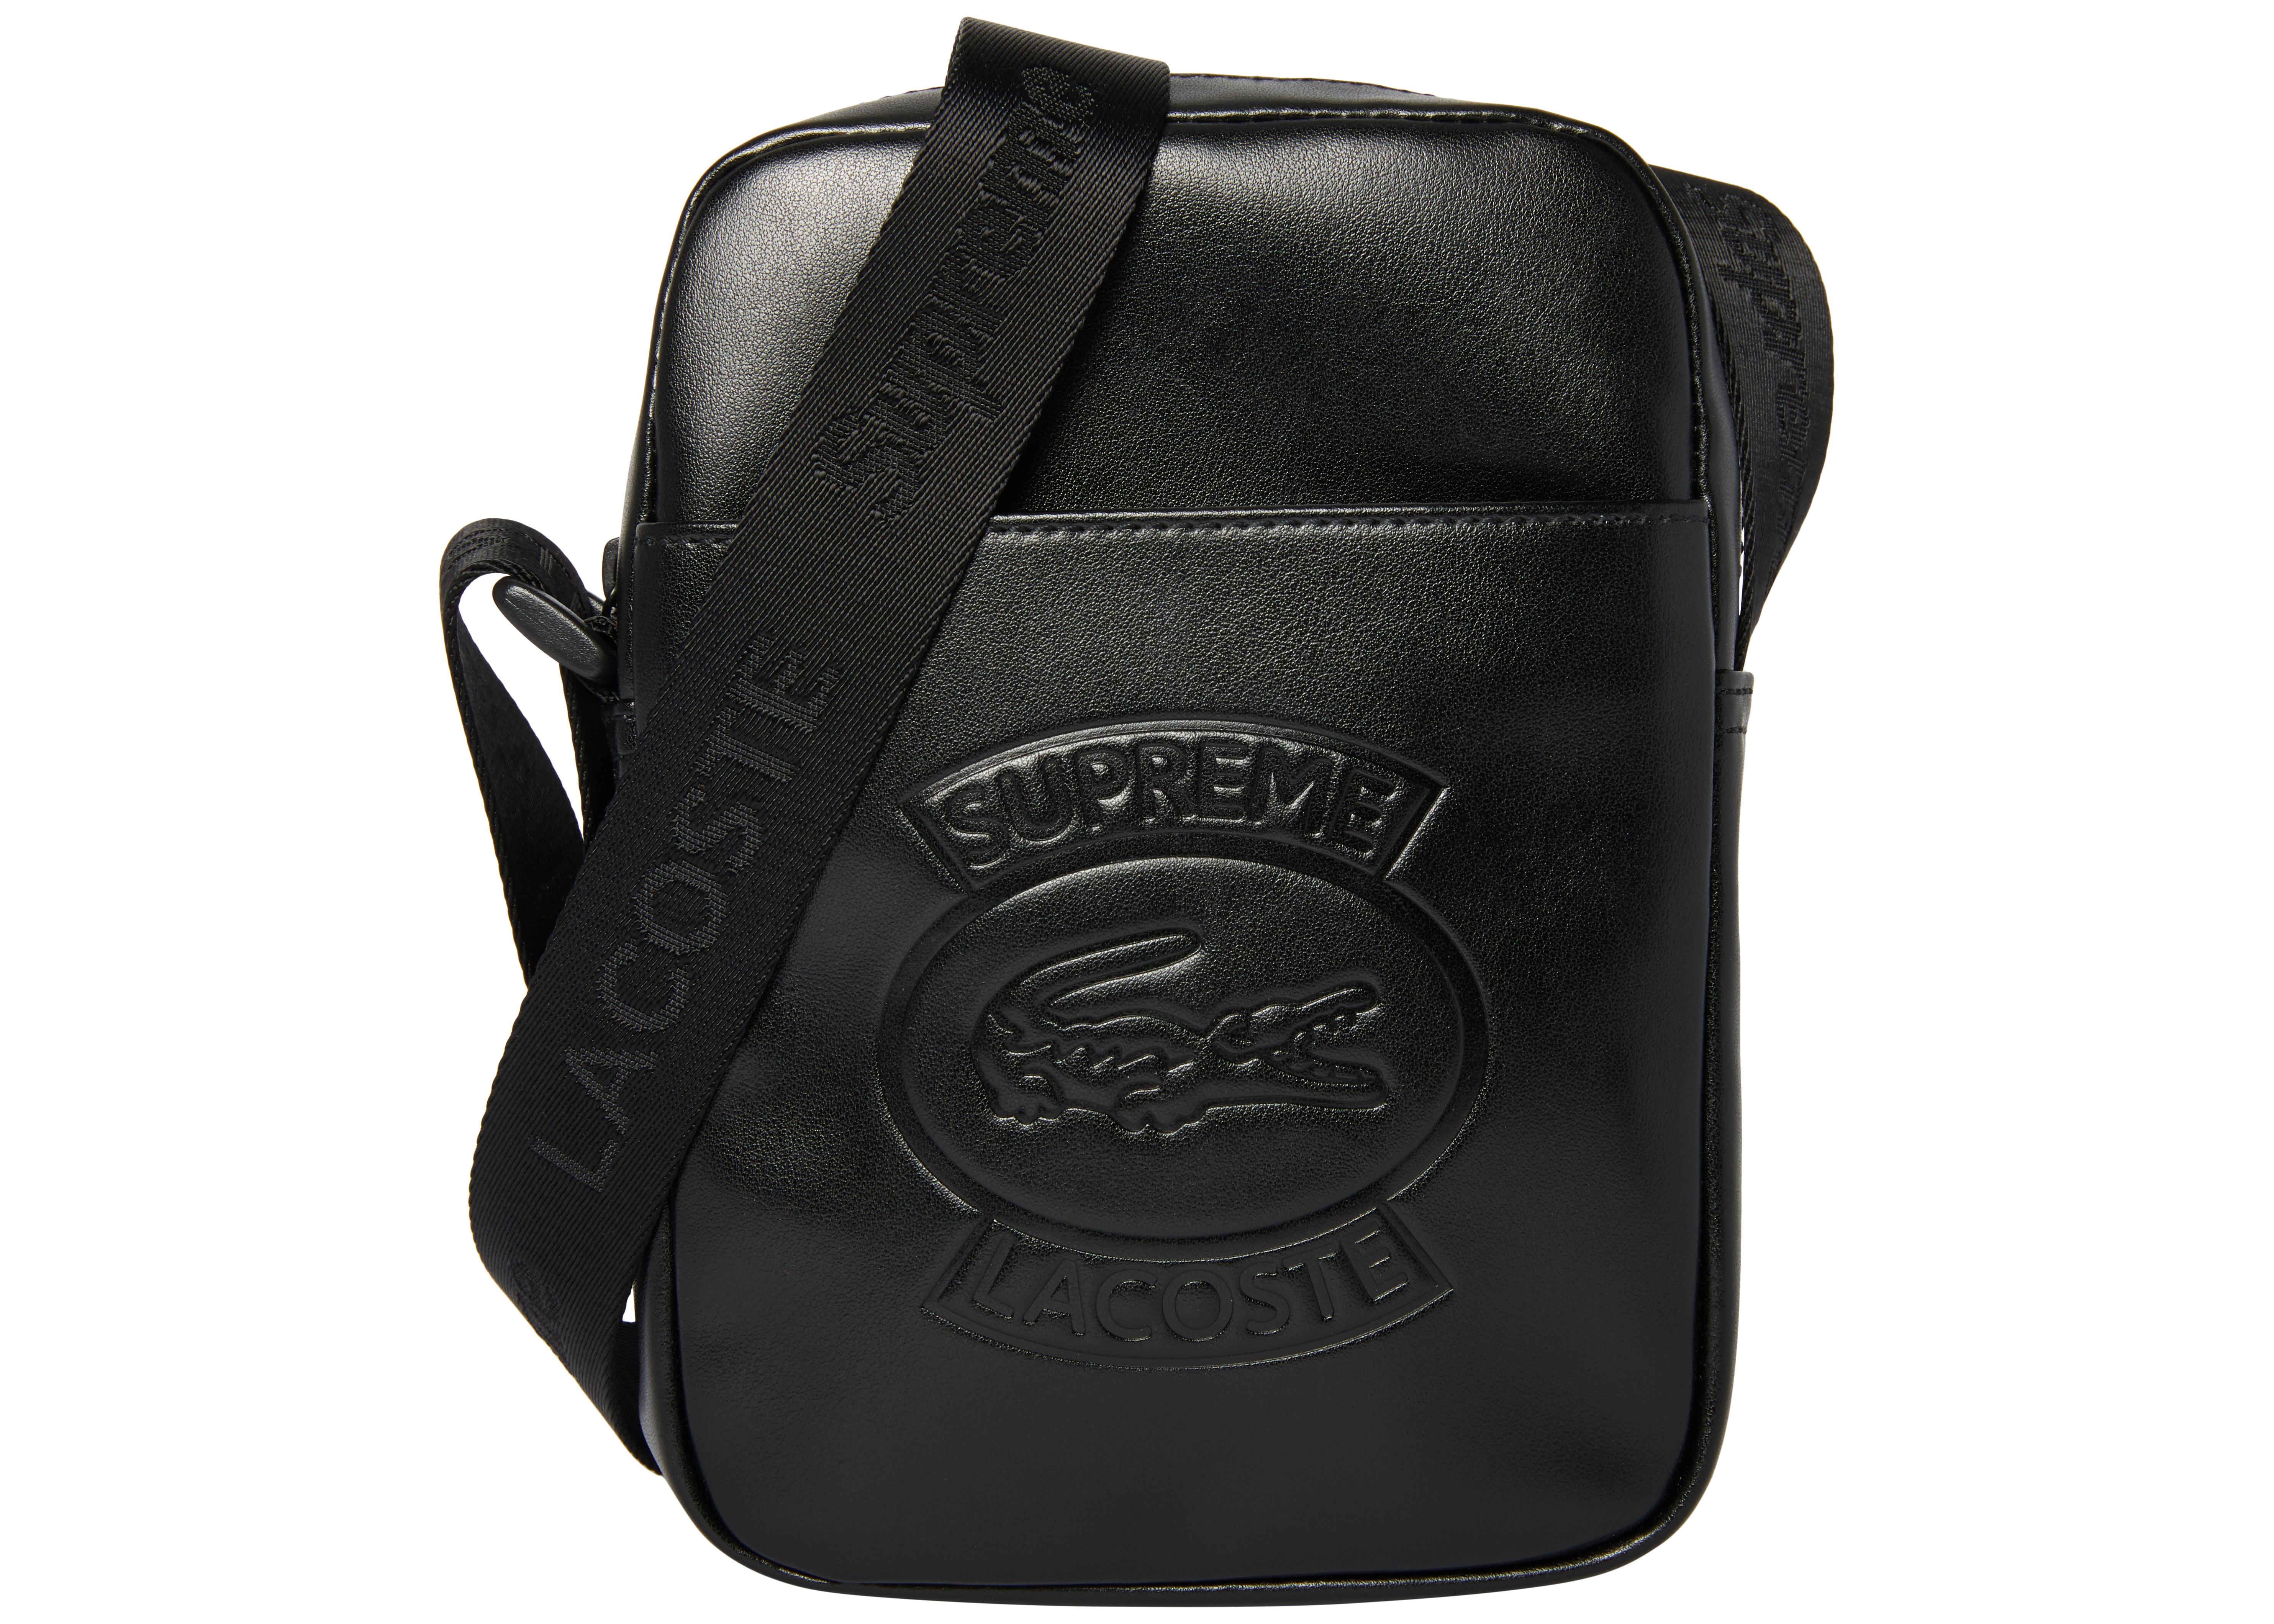 Lacoste Supreme Supreme Lacoste Shoulder Bag Bag Shoulder Supreme Lacoste Black Shoulder Bag Black A35LjcqS4R